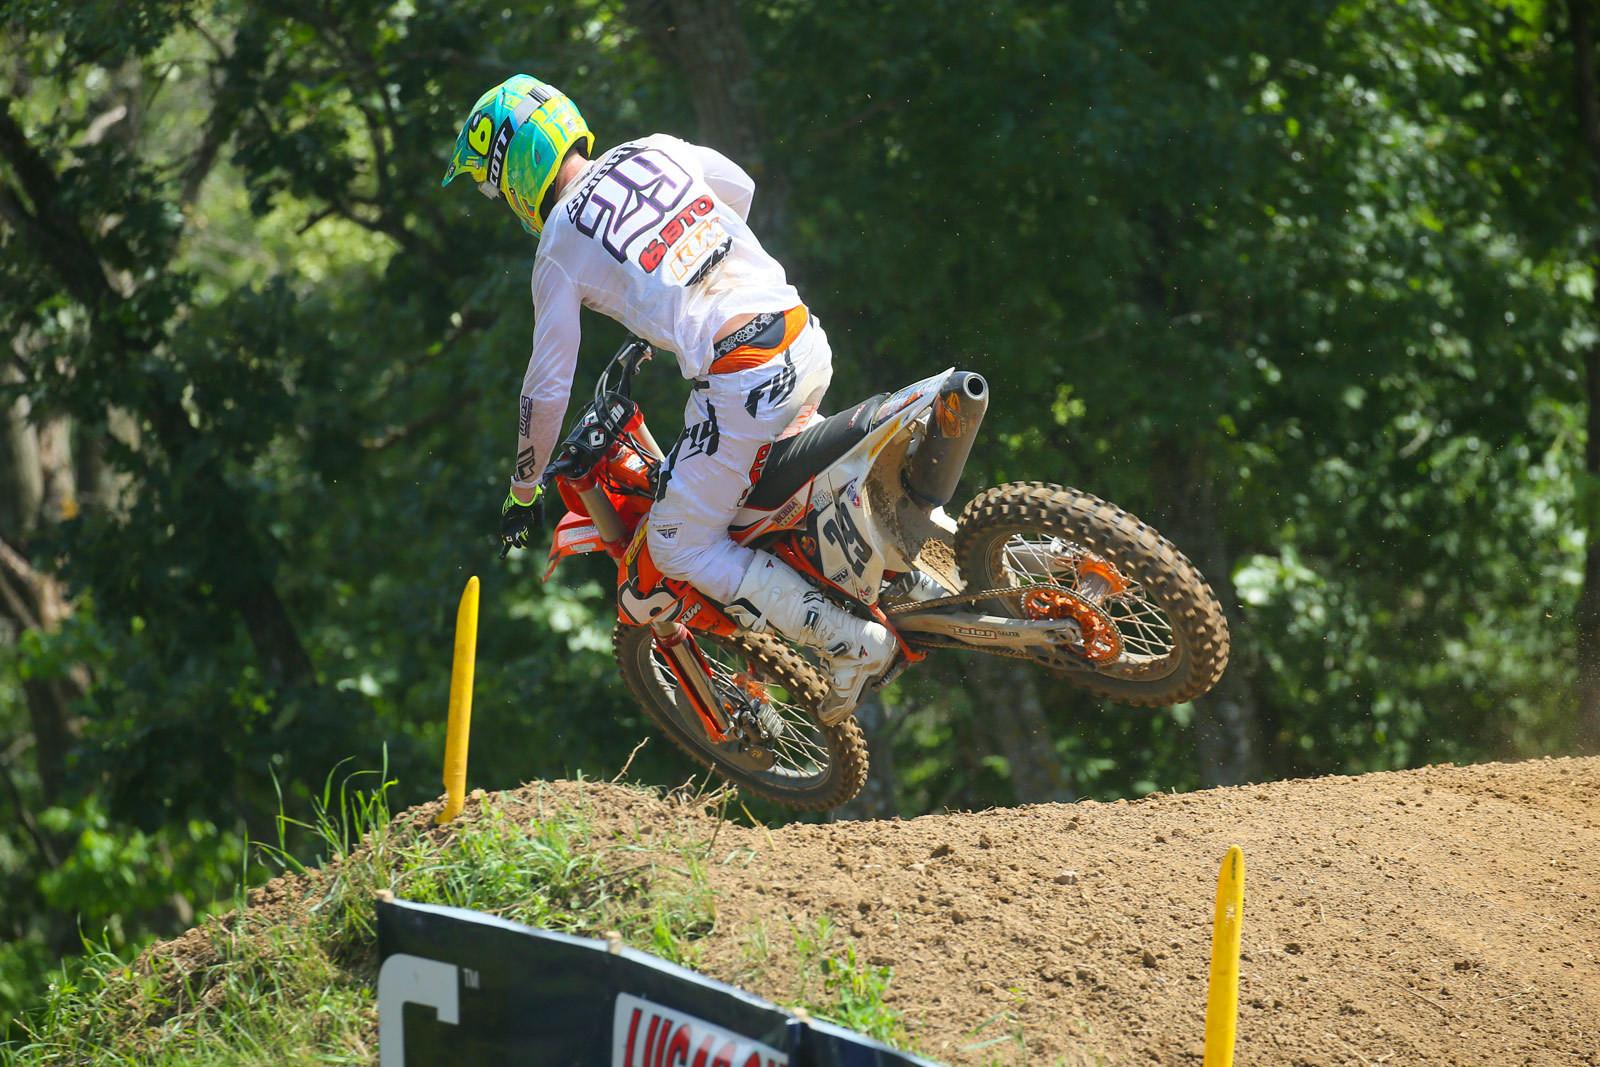 Andrew Short - Photo Blast: Spring Creek - Motocross Pictures - Vital MX